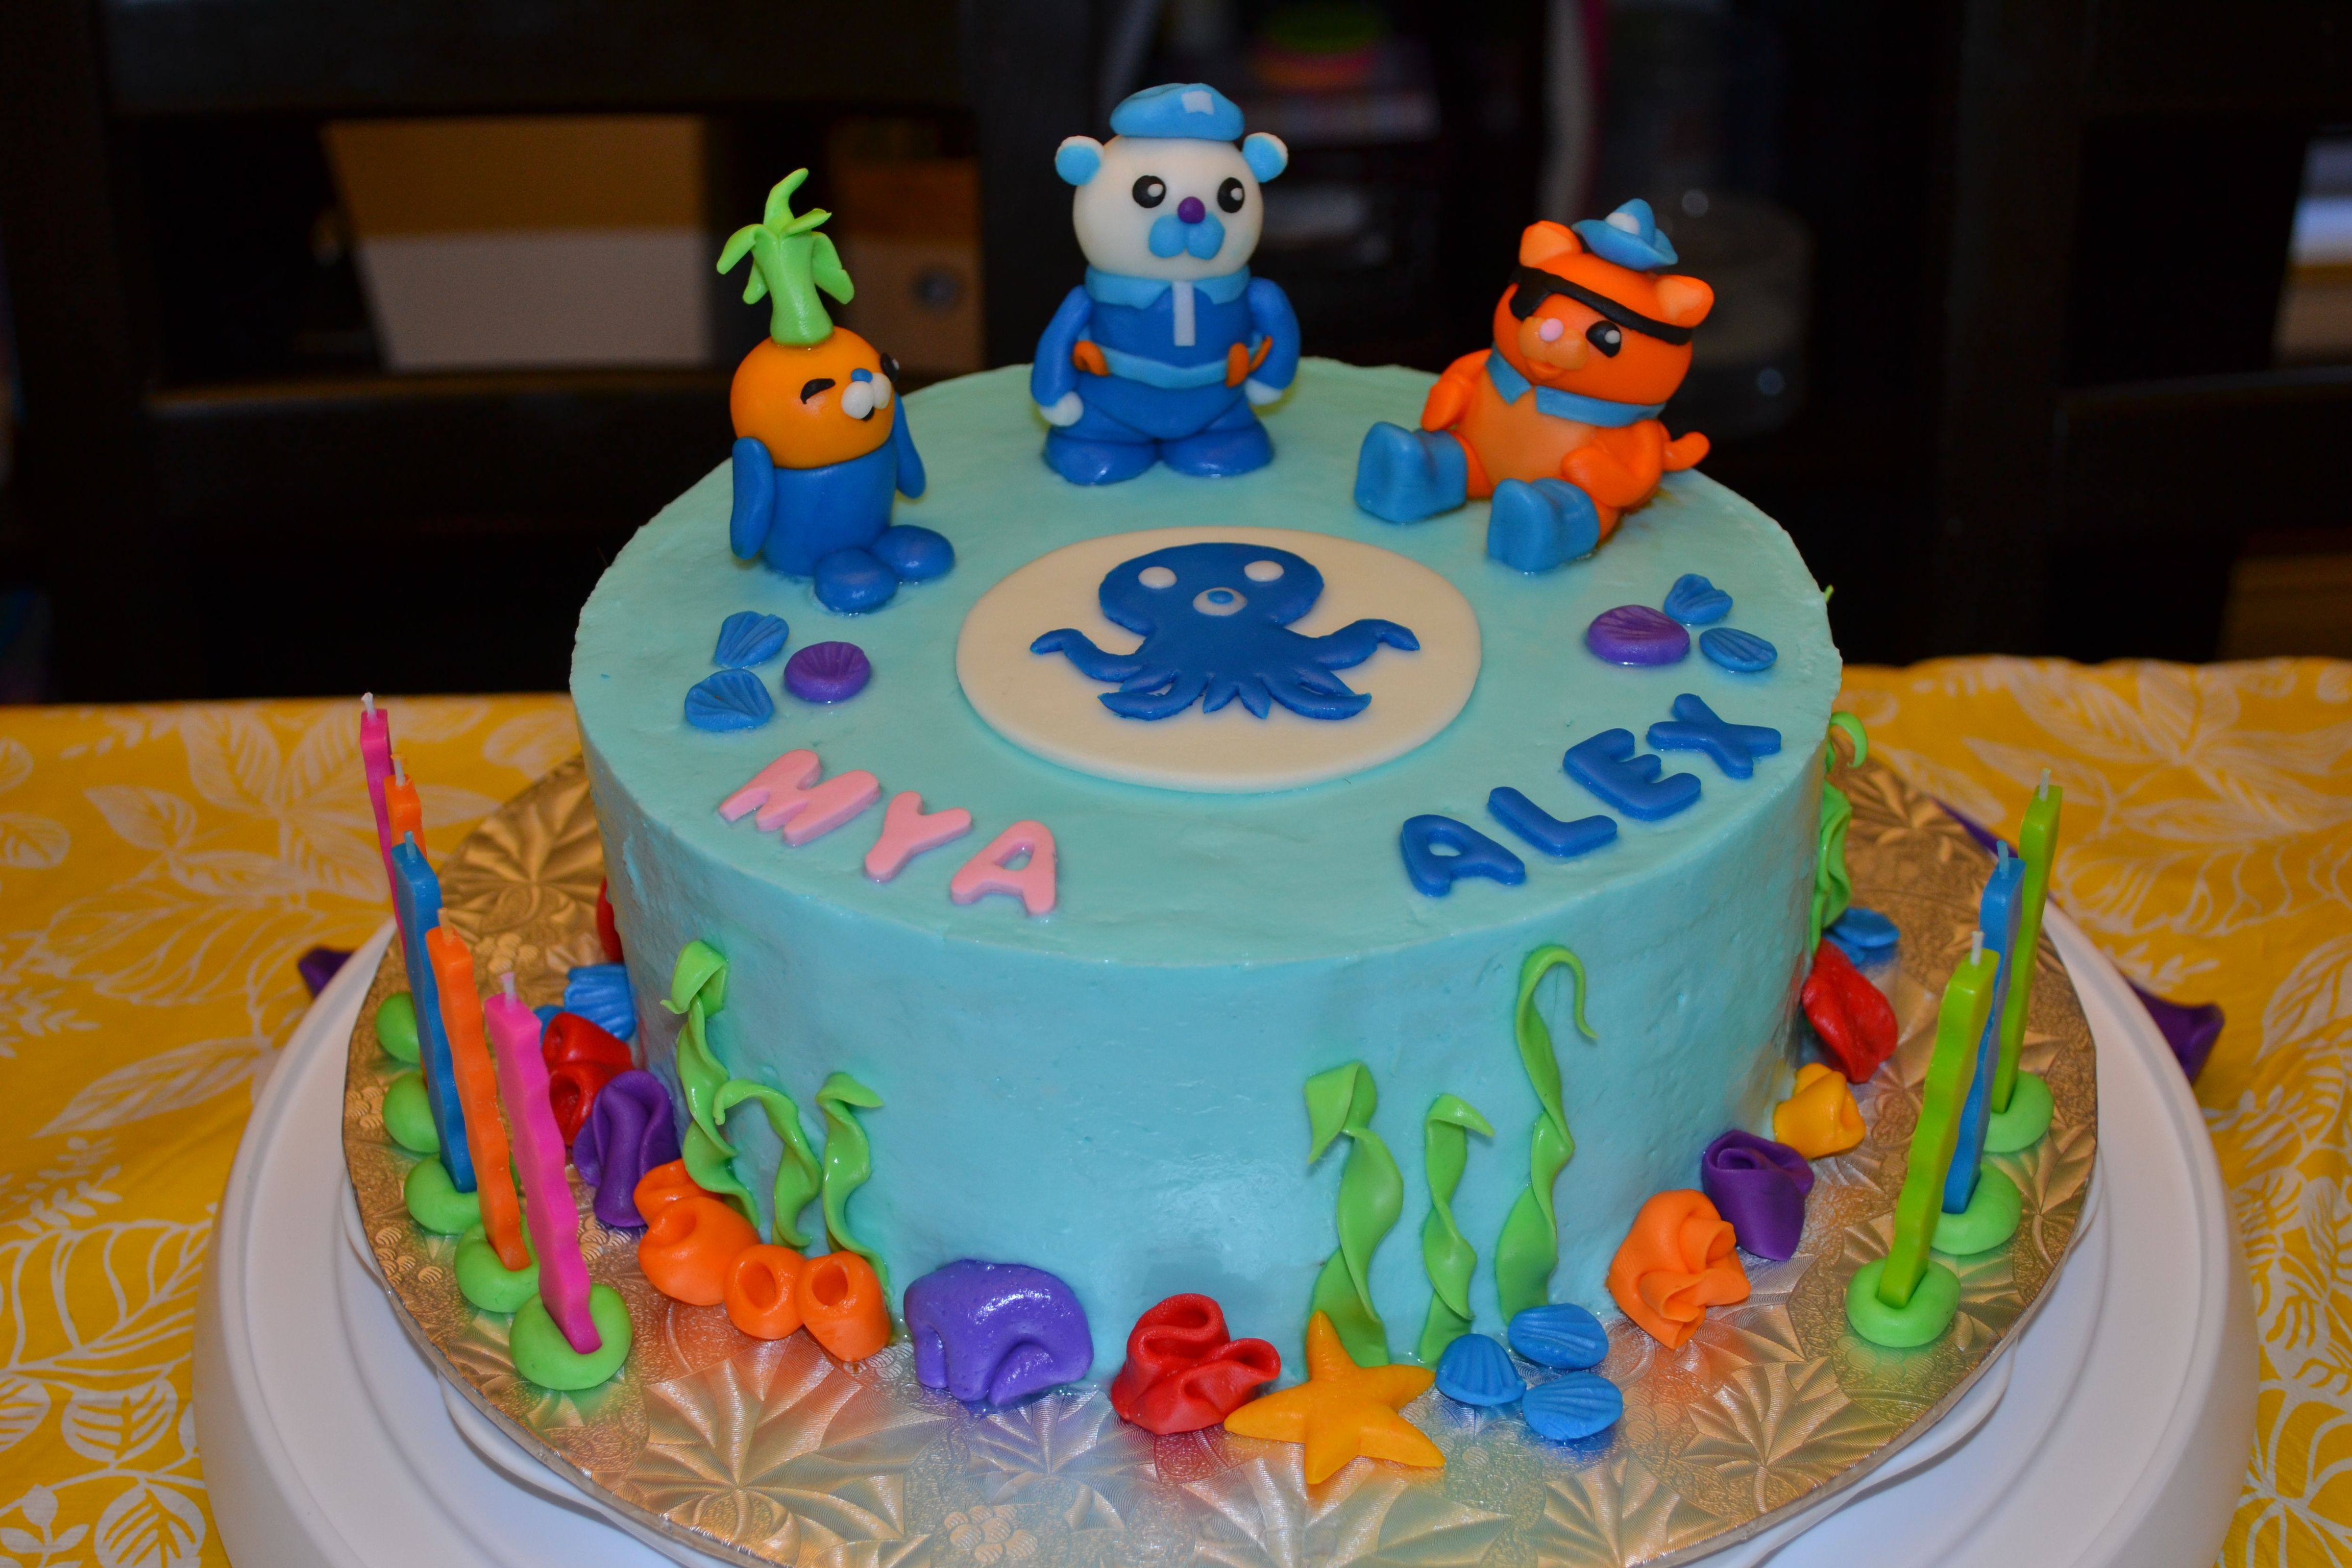 Octonauts Cake | Octonauts cake, Octonauts party